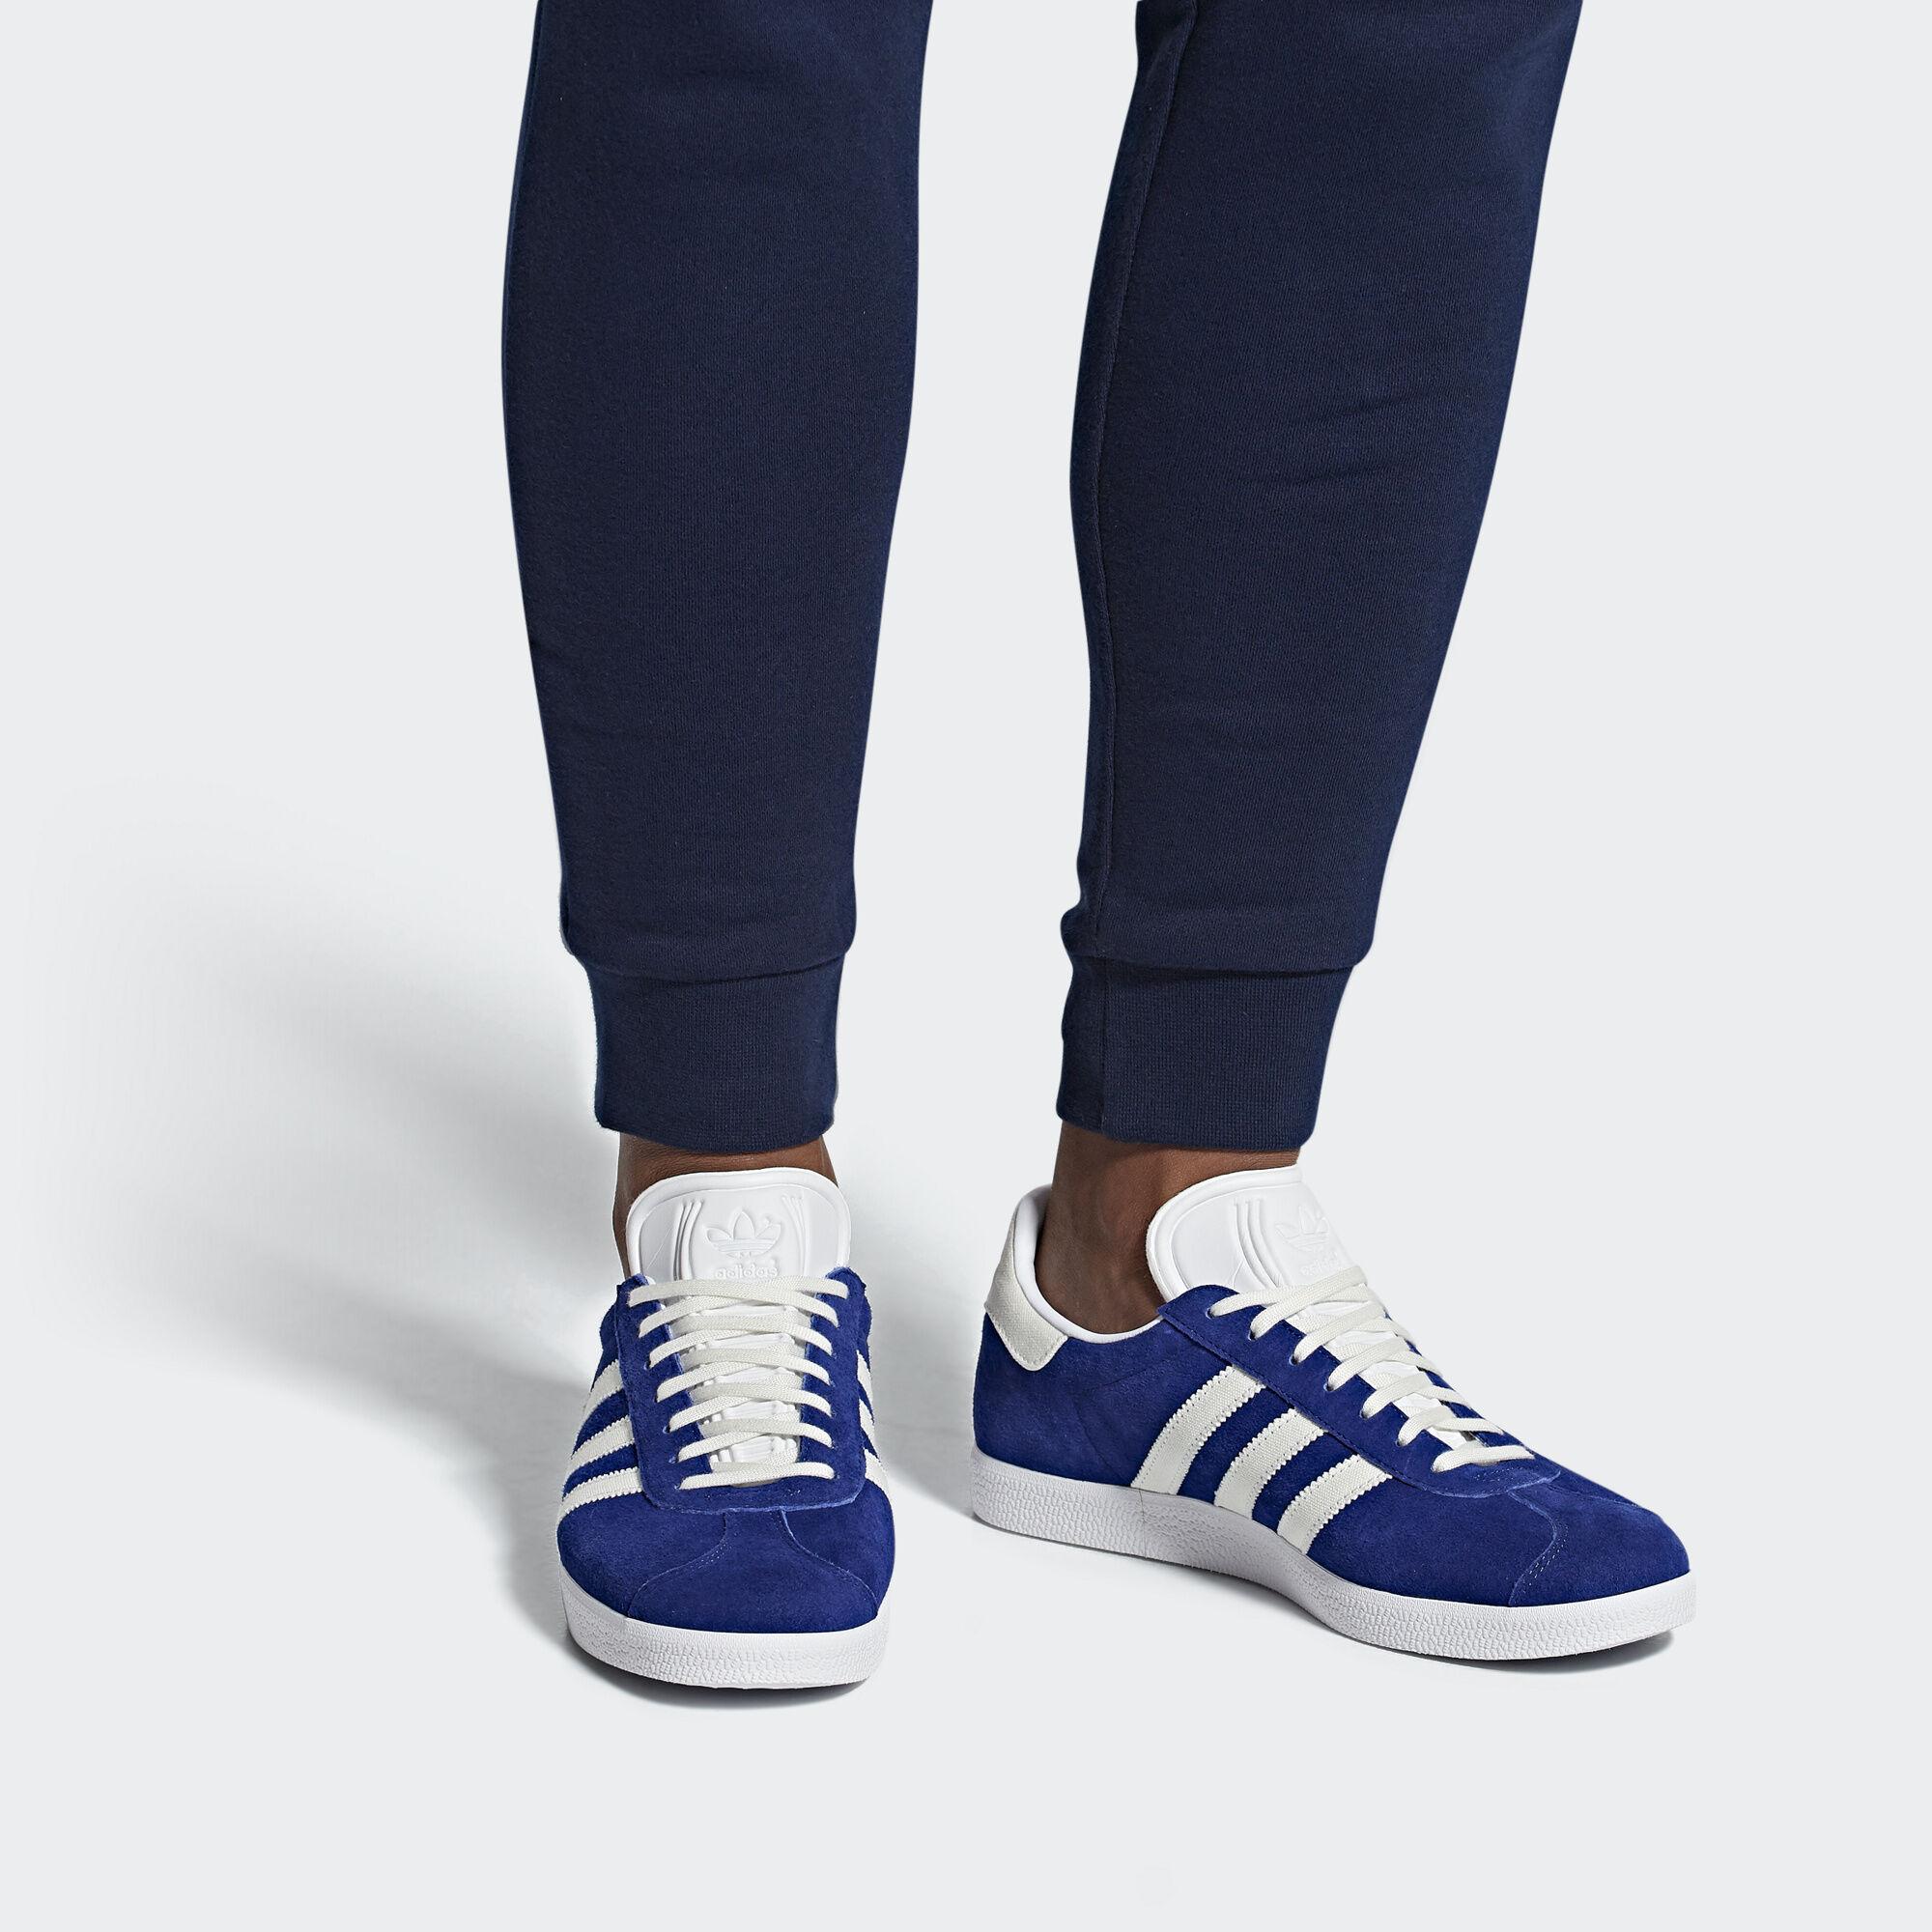 adidas Gazelle Shoes - Blue  71f1a2e91